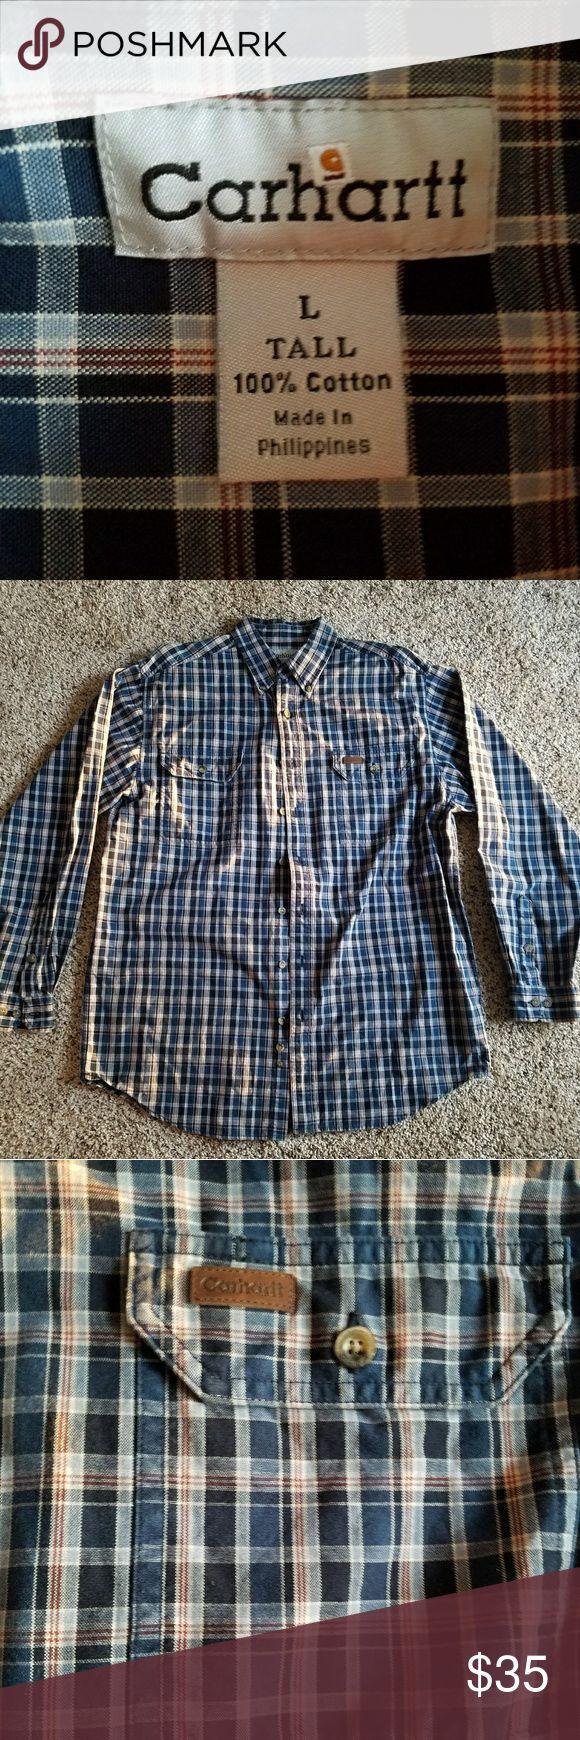 NWOT Carhartt Mens Long Sleeve Work Shirt Size L Never worn, super clean! Beautifully made! Carhartt Shirts Tees - Long Sleeve